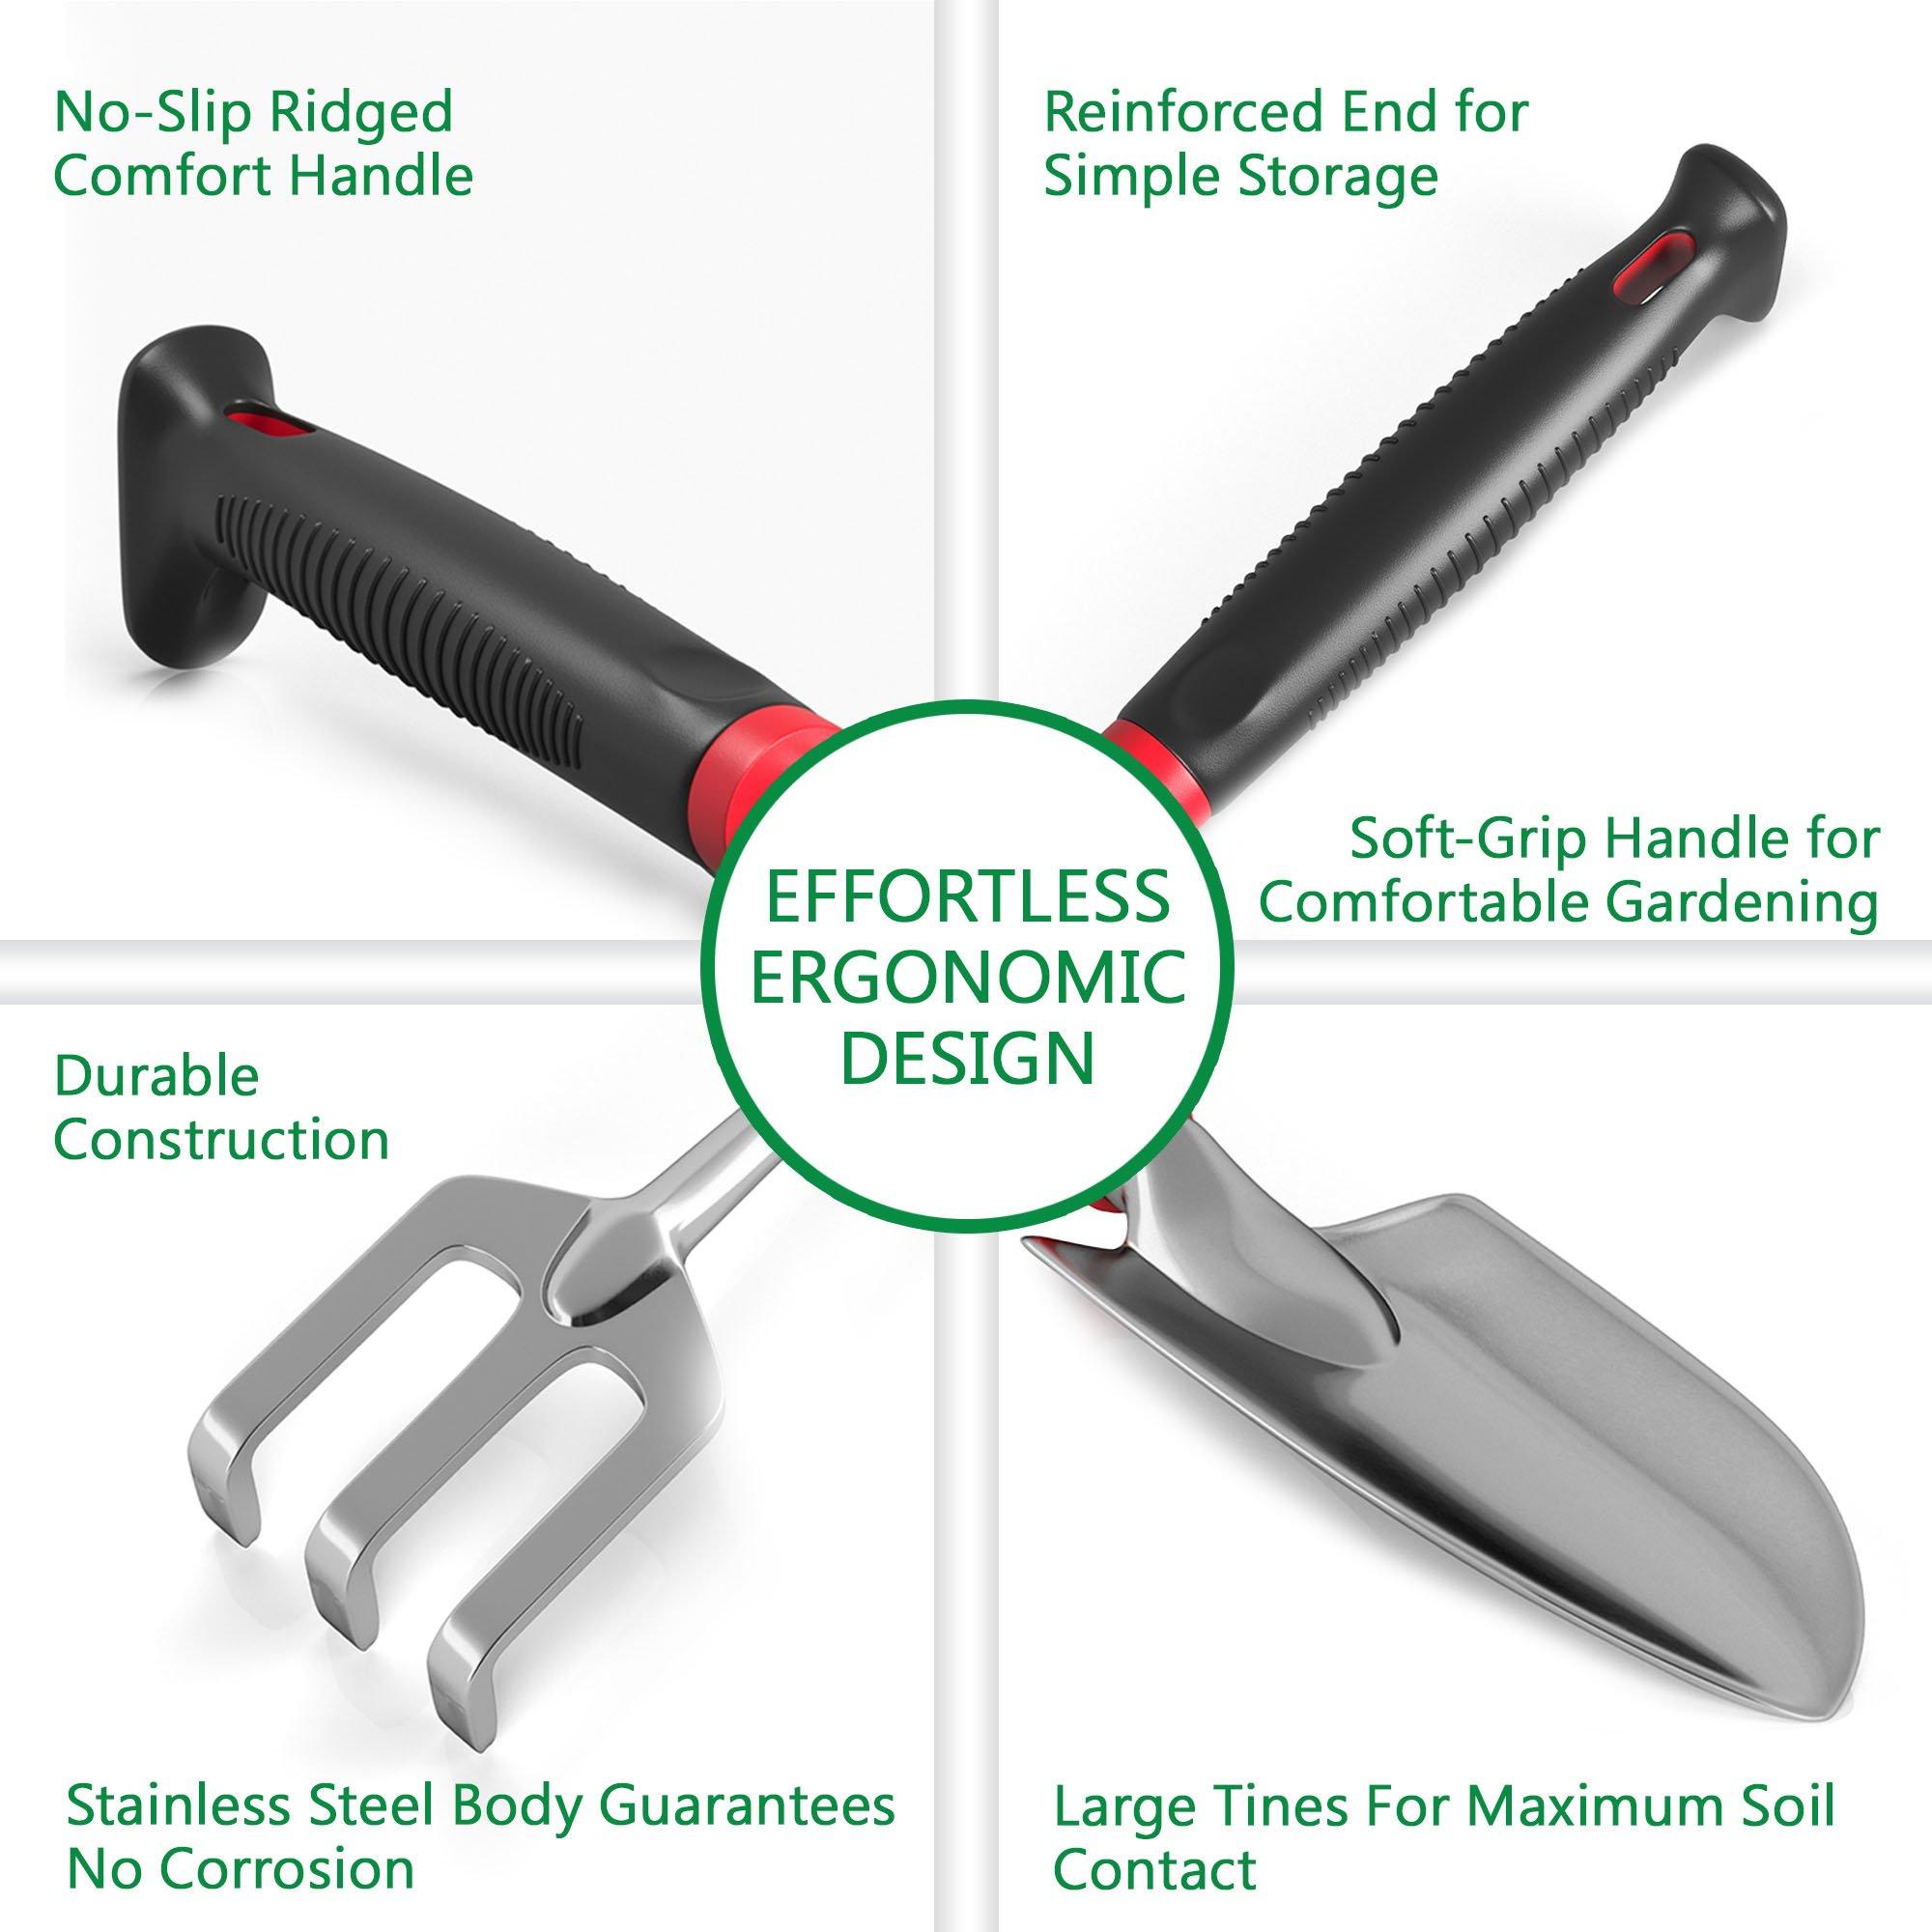 Comfort Plus 7-Piece Gardening Tool Set - Includes EZ-Cut Pruners, Lightweight Aluminum Tools with Soft Rubber Handles and Ergonomic Garden Tote and High Density Comfort Knee Pads by Sleek Garden (Image #8)